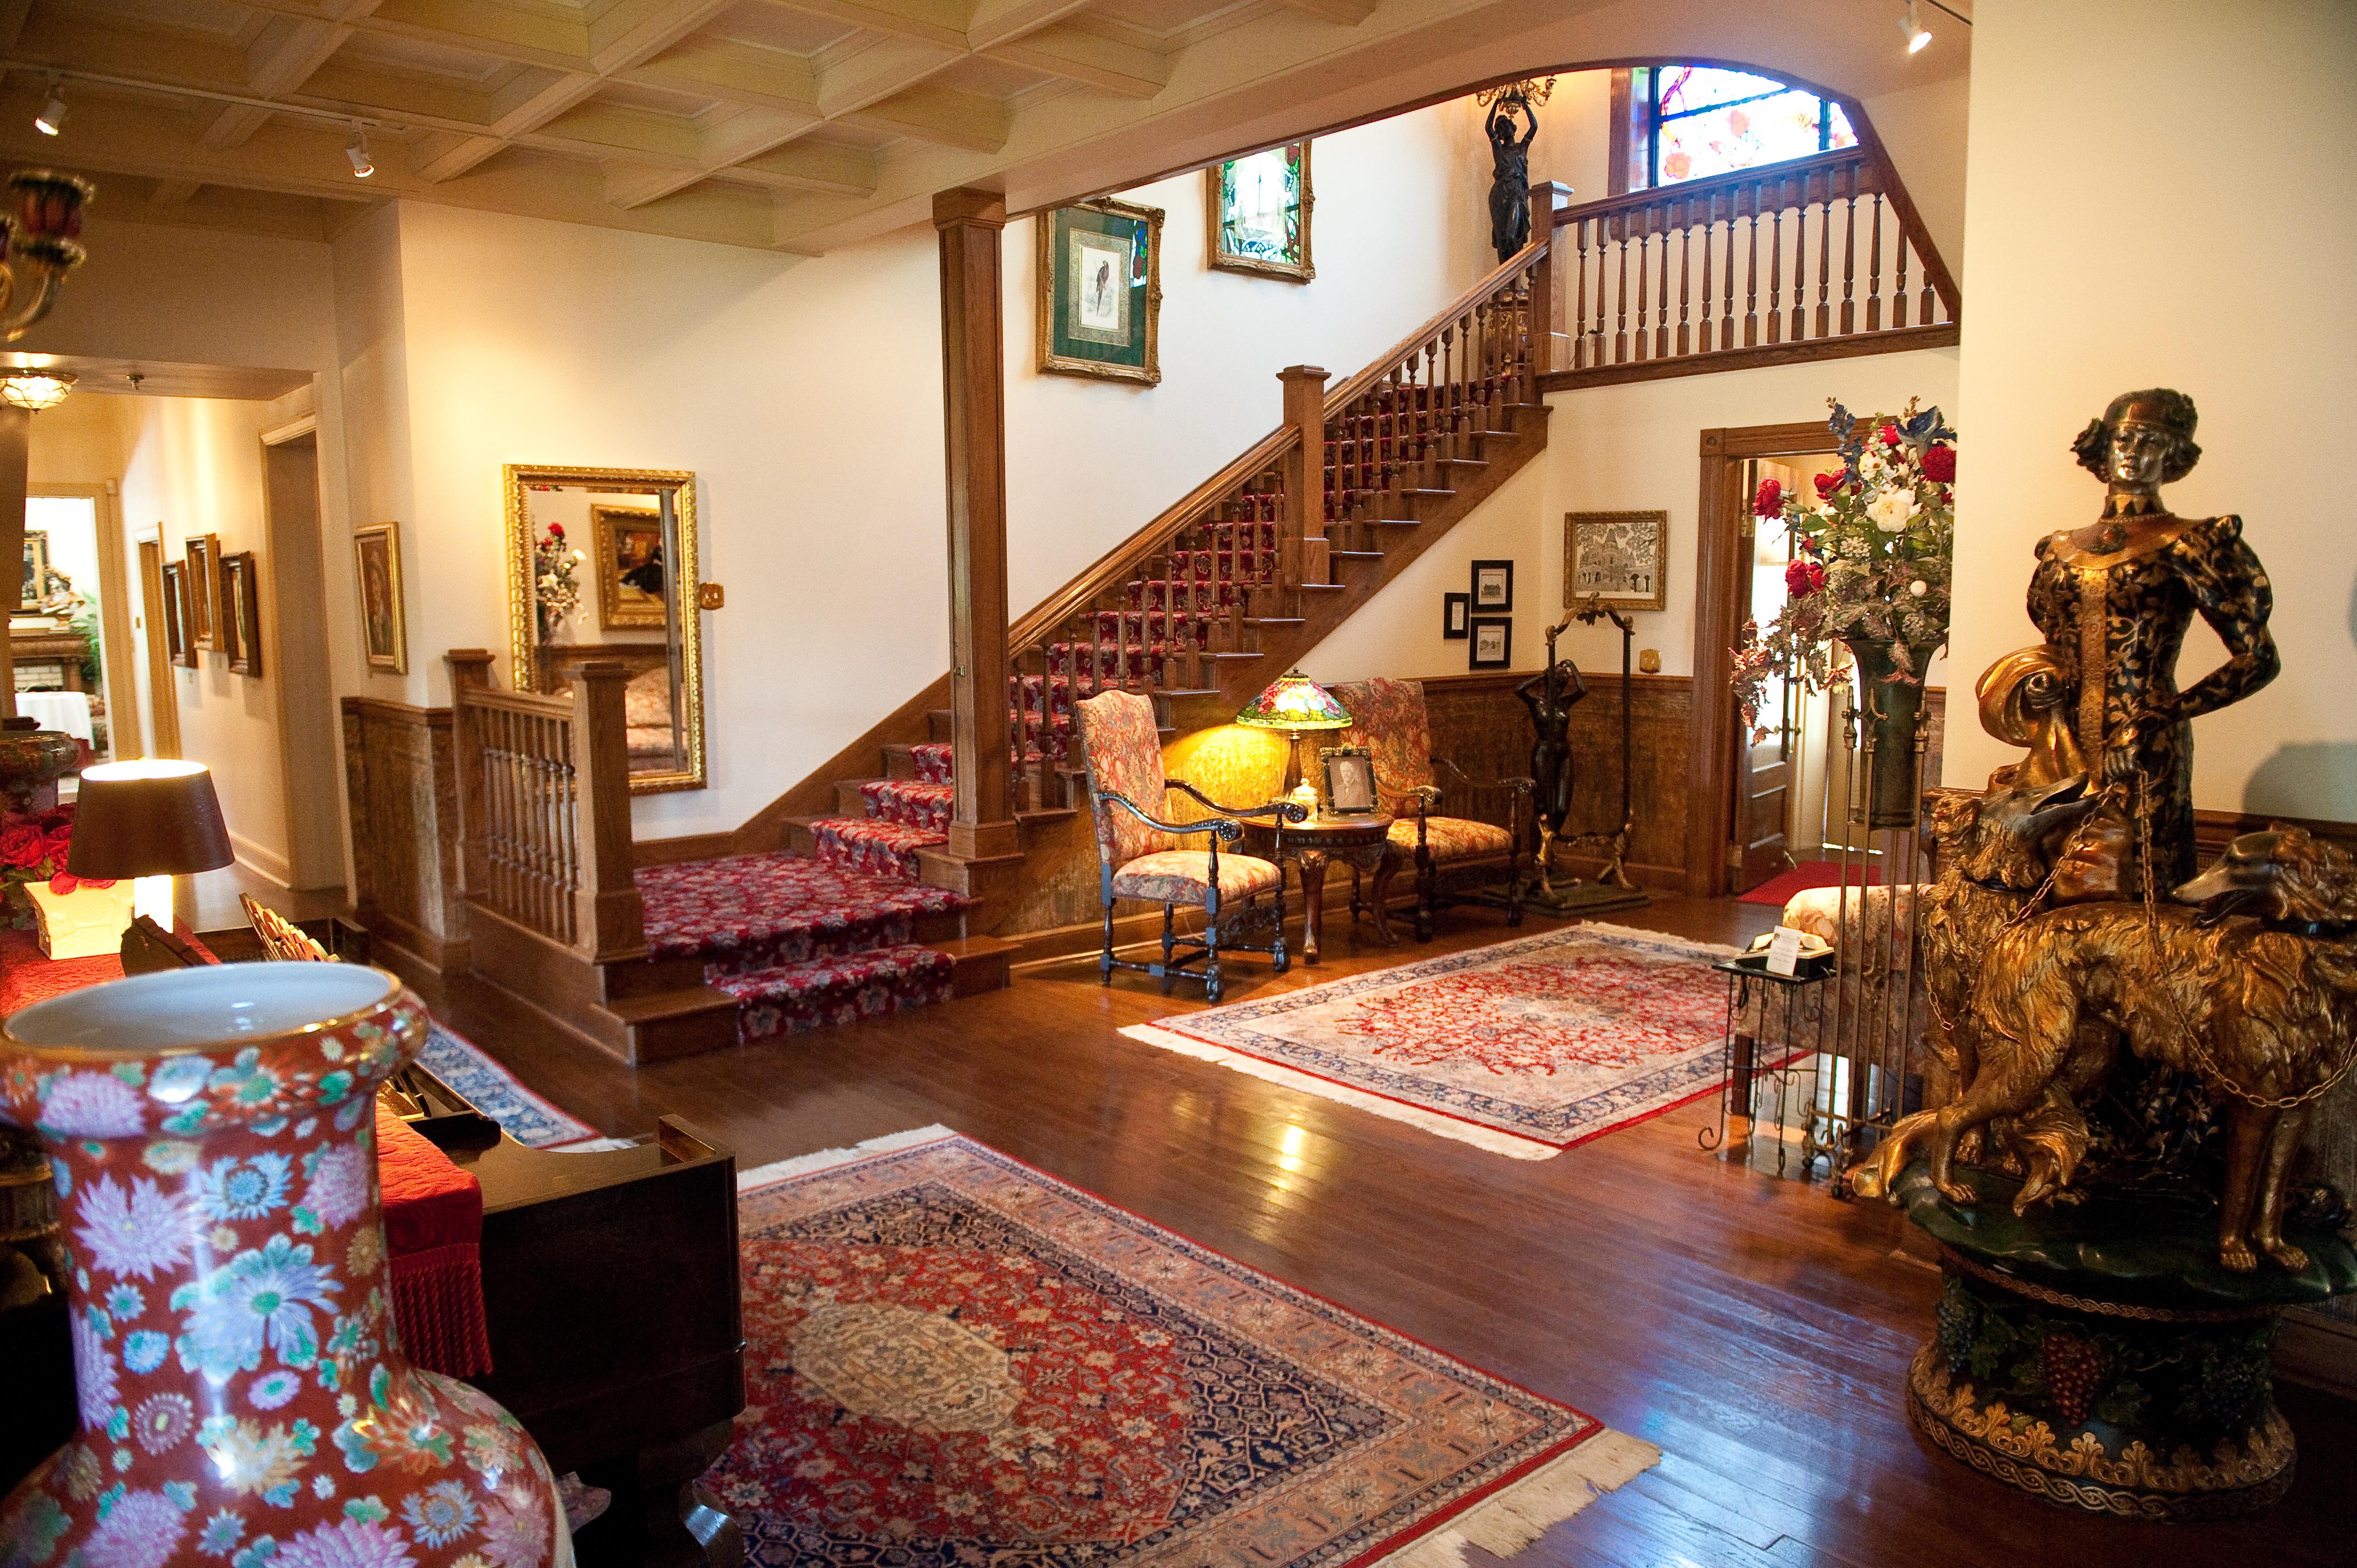 AwardWinning Inns from Winner Hospitality Buhl Mansion